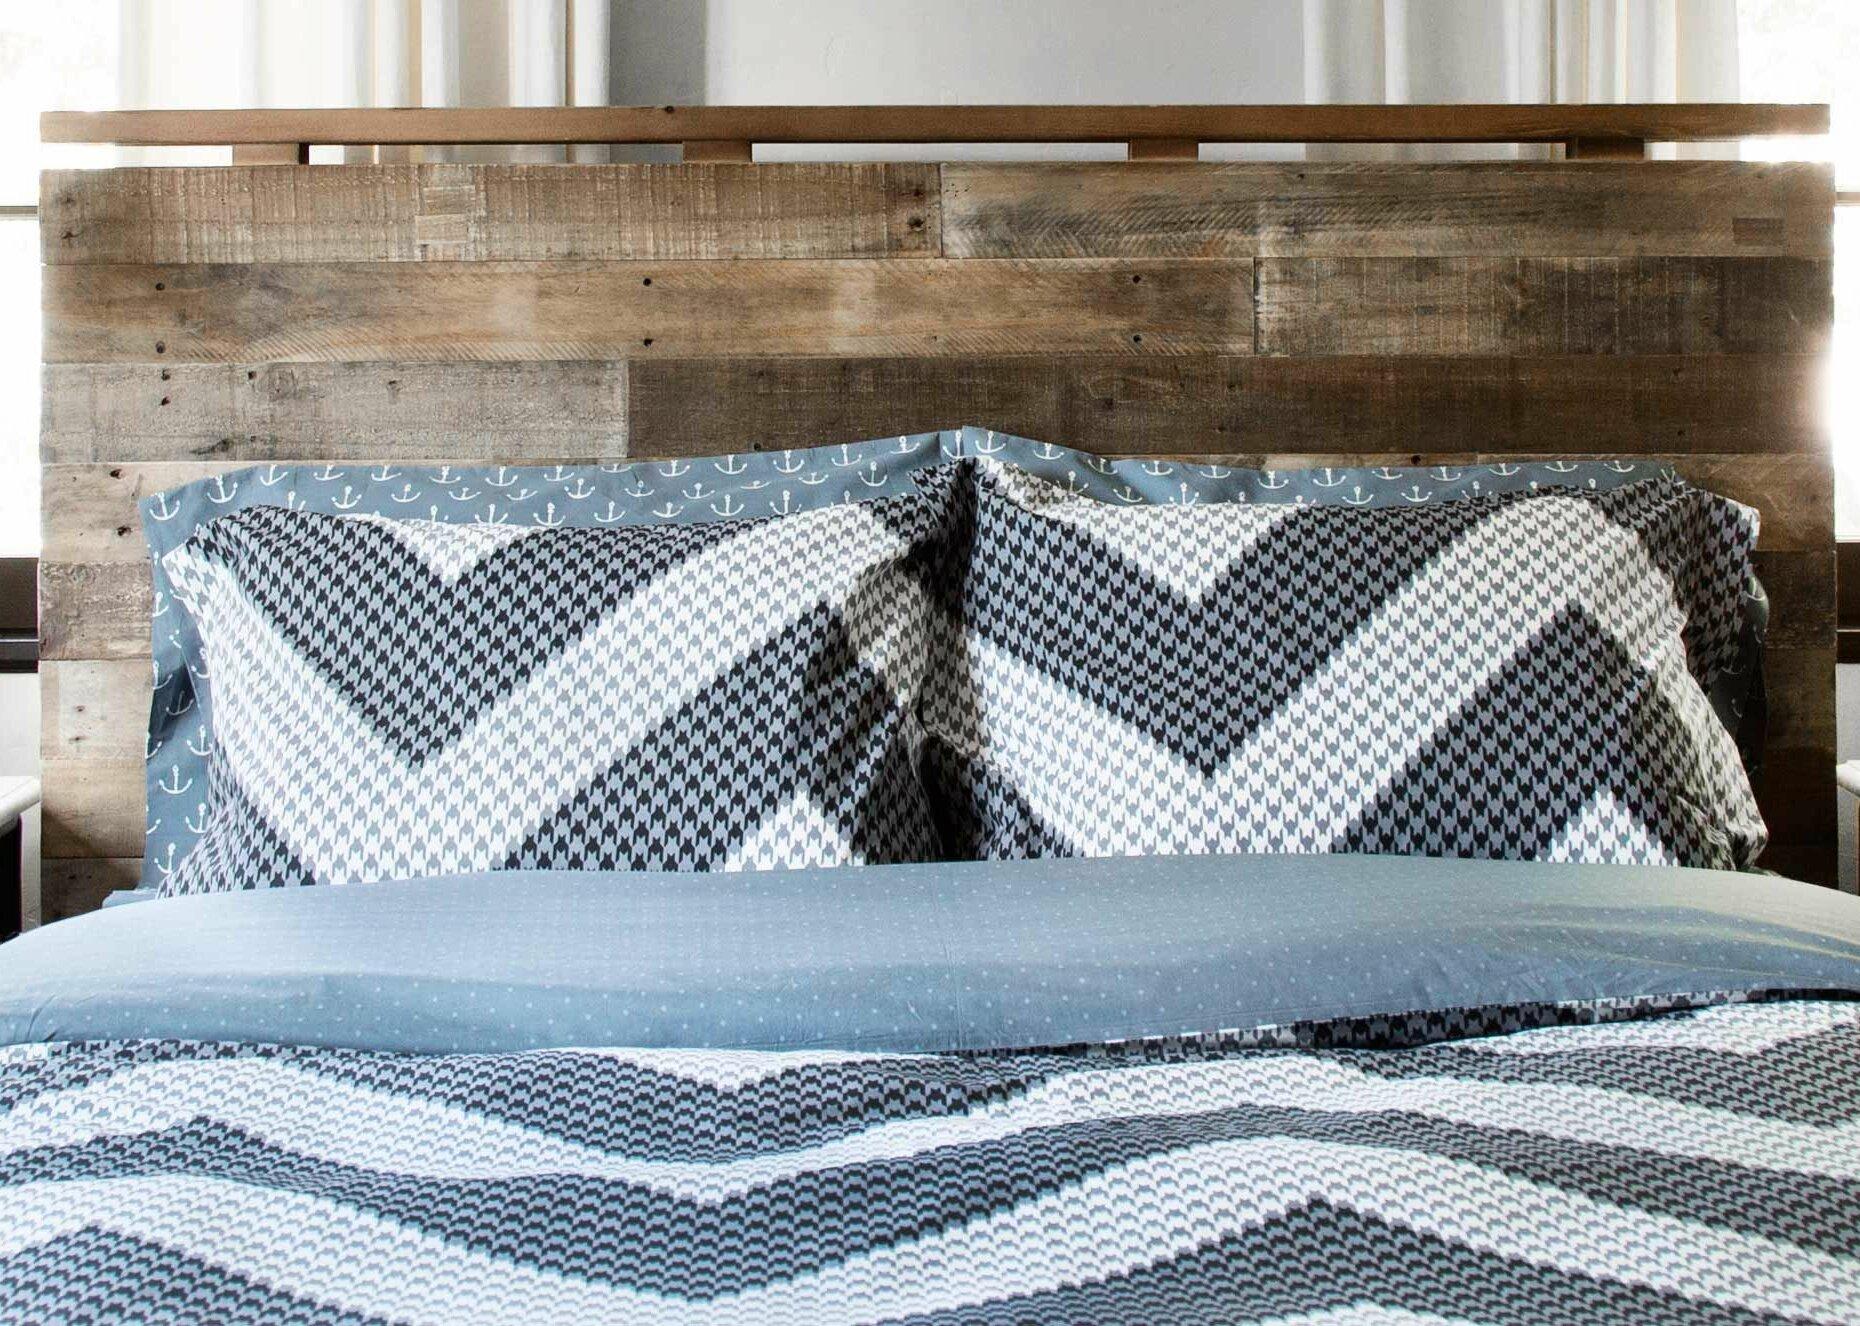 Bed N/' Basics Padded Comforter  Duvet Clips Blanket Fasteners To Secure Beddi